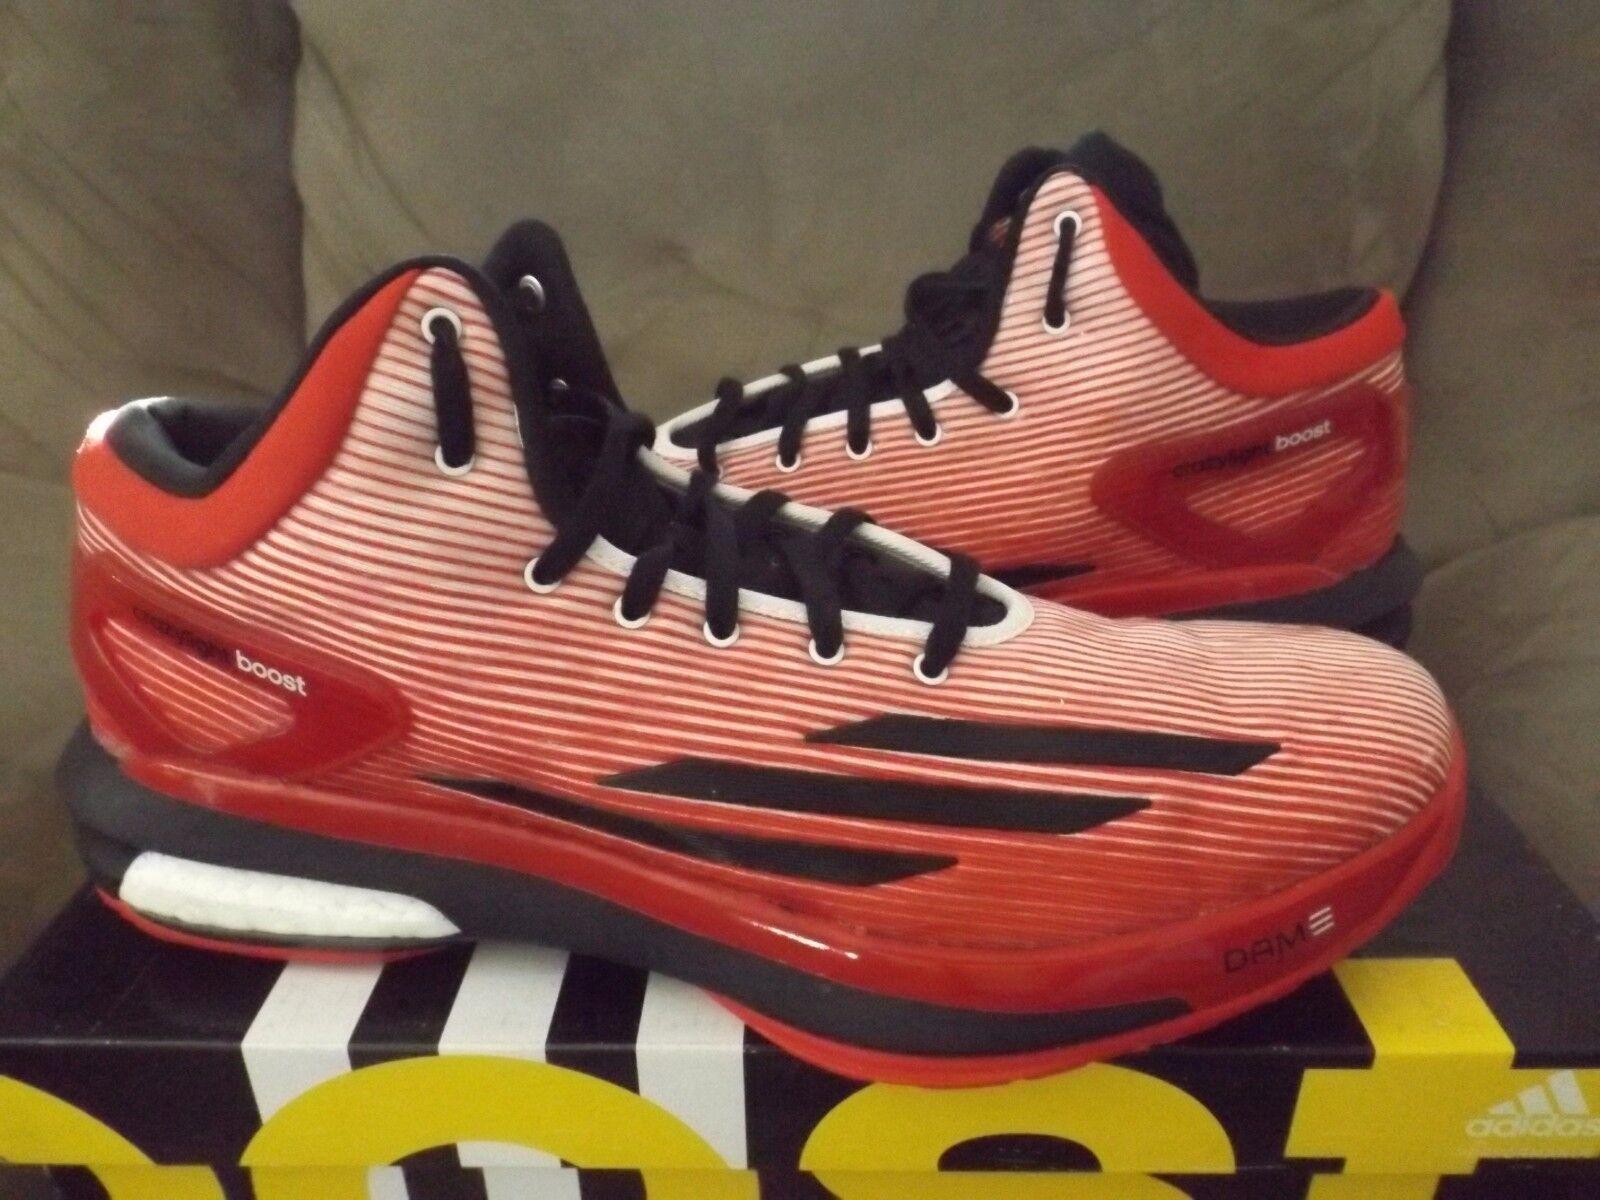 Adidas Crazylight Boost DAMIAN LILLARD Men's Basketball shoes C76574 Red (NEW)